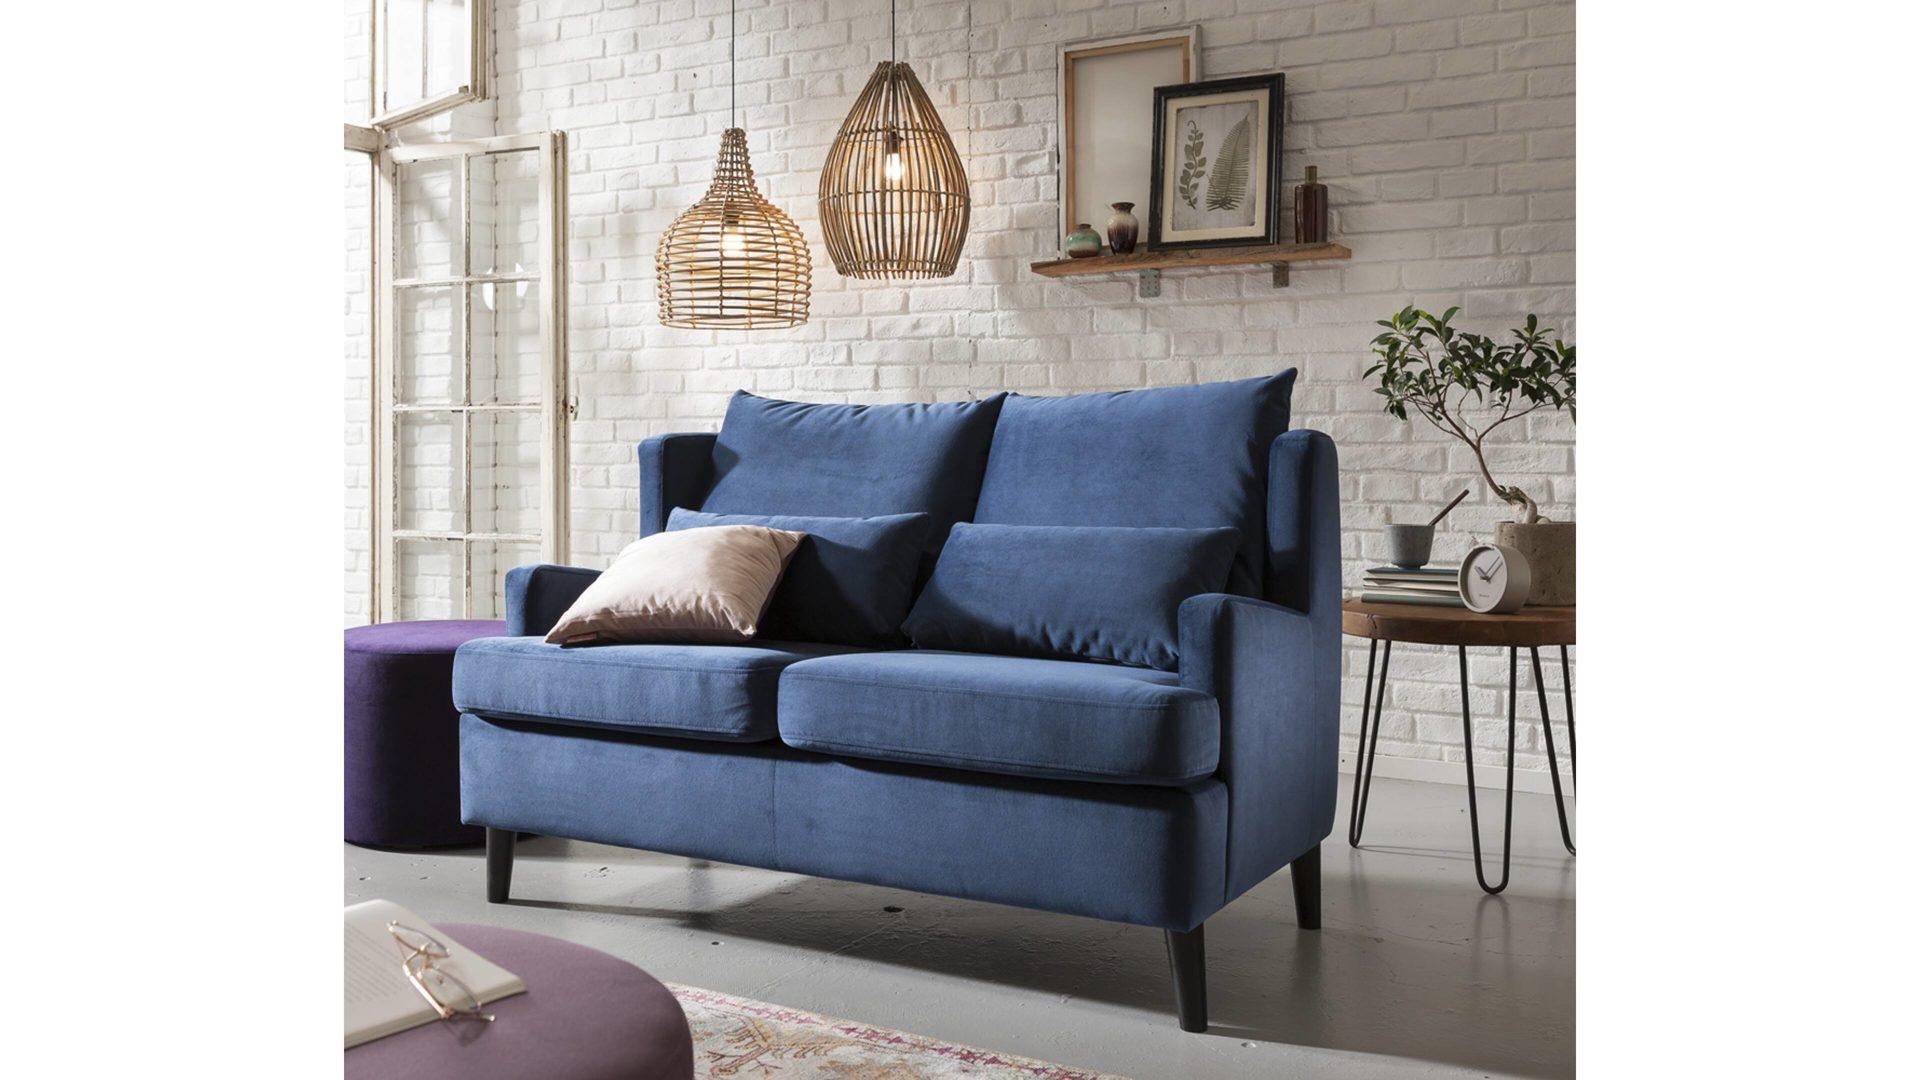 Kawoo Zweisitzer Sofa Carlton Polstermöbel Marineblauer Samtbezug